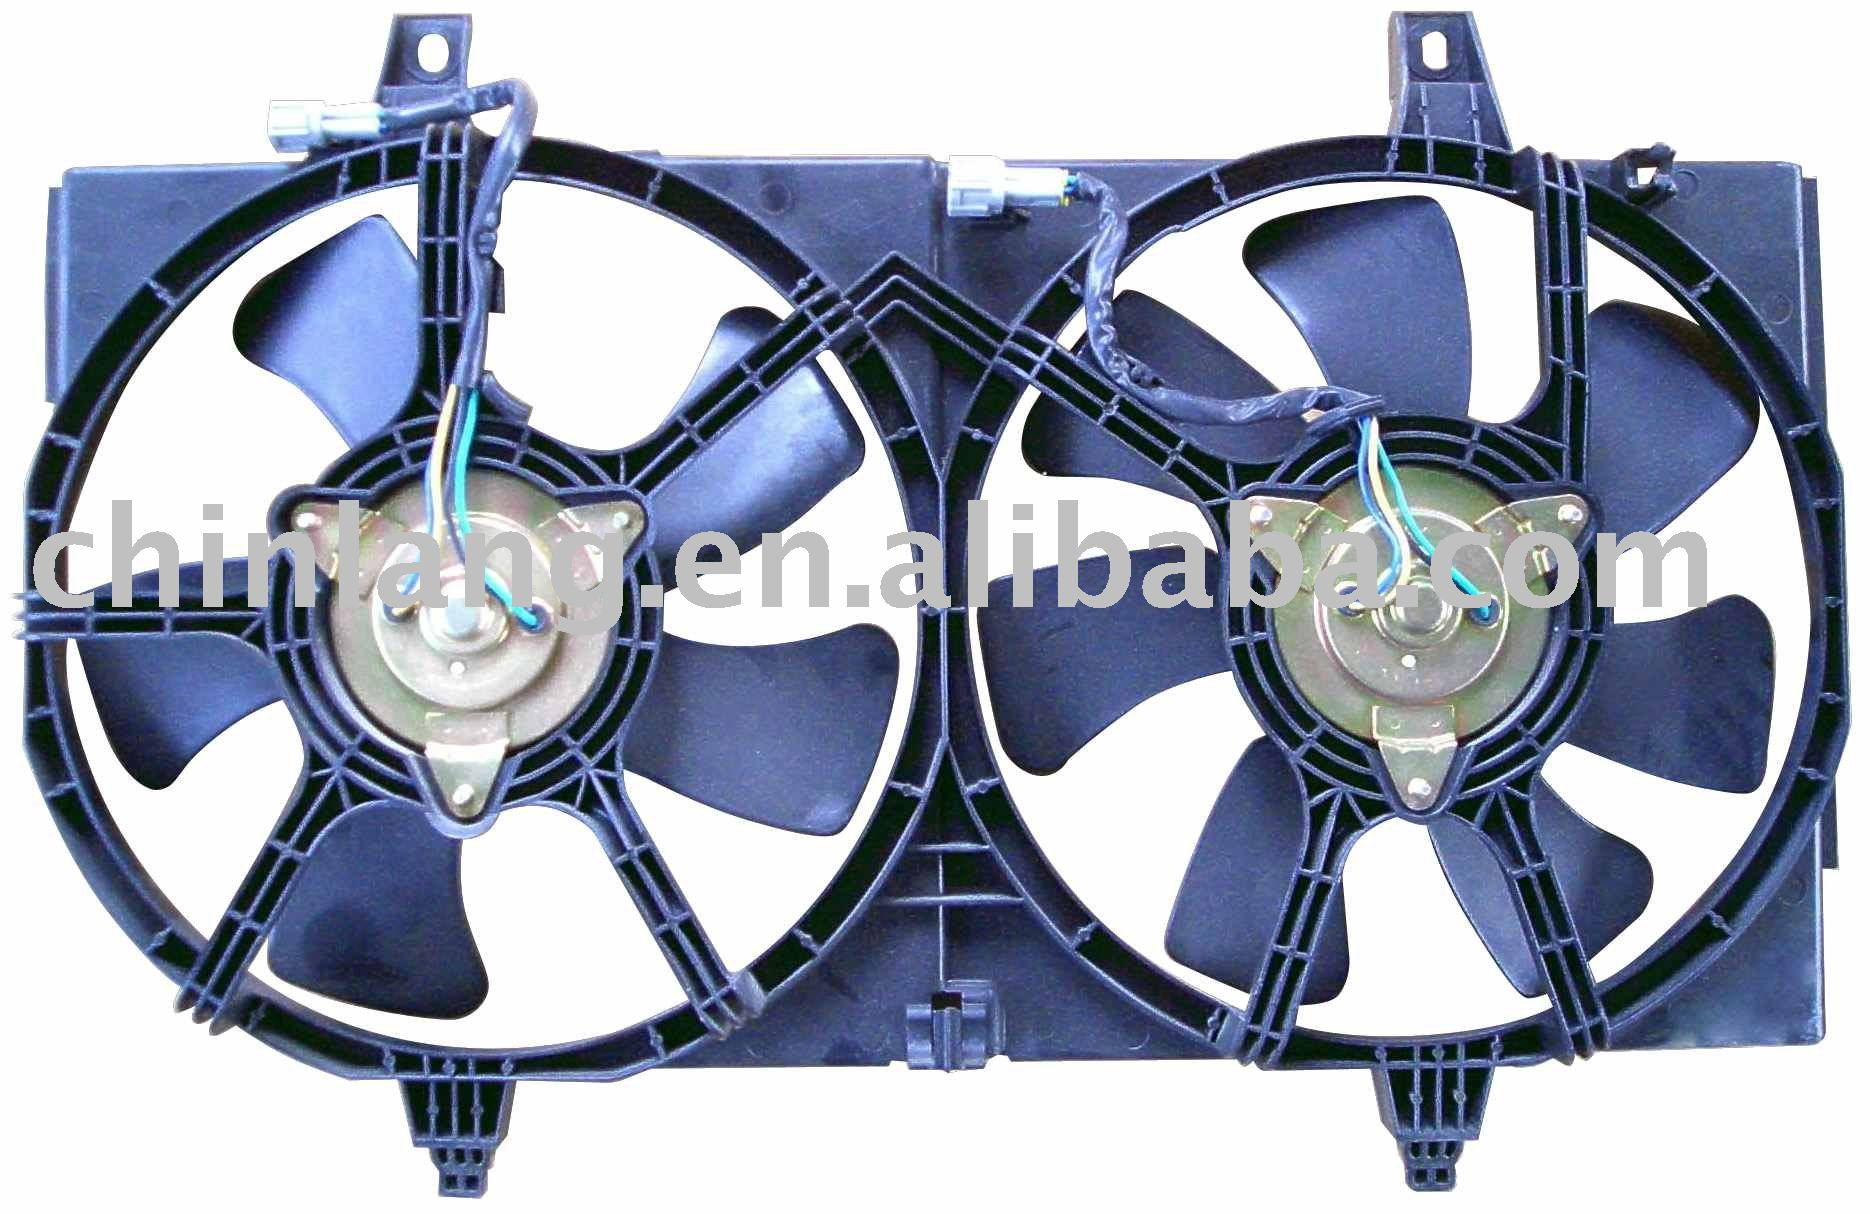 hight resolution of wrg 0325 2005 nissan altima radiator fan fuse box 2005 nissan altima radiator fan fuse